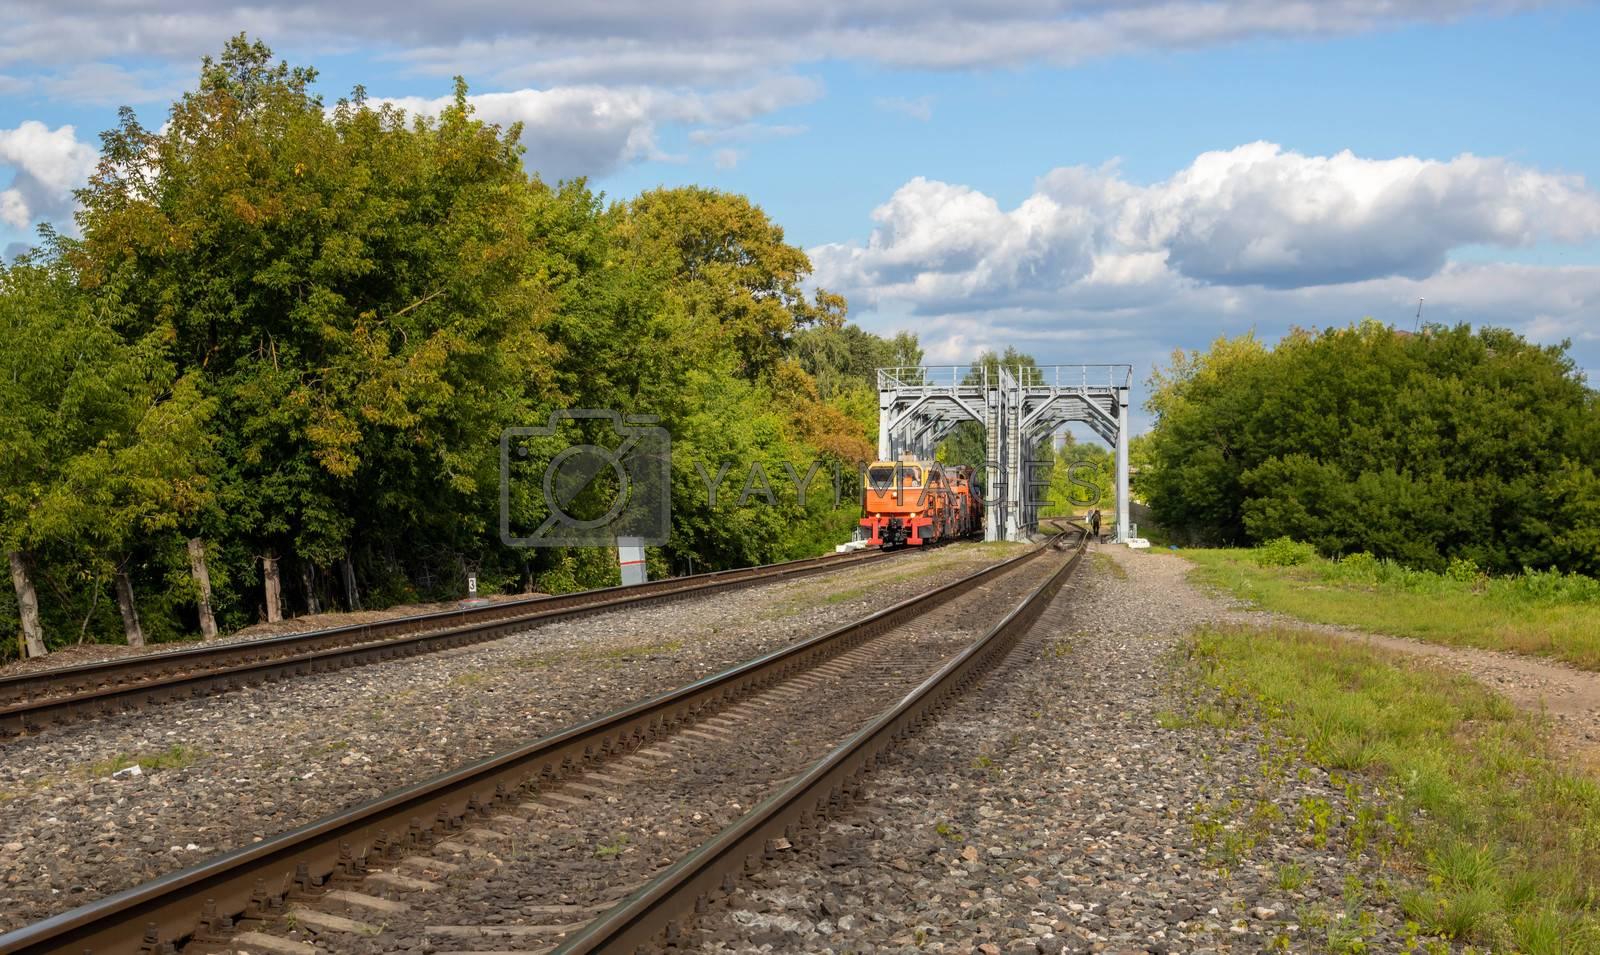 On the railway bridge is a locomotive.